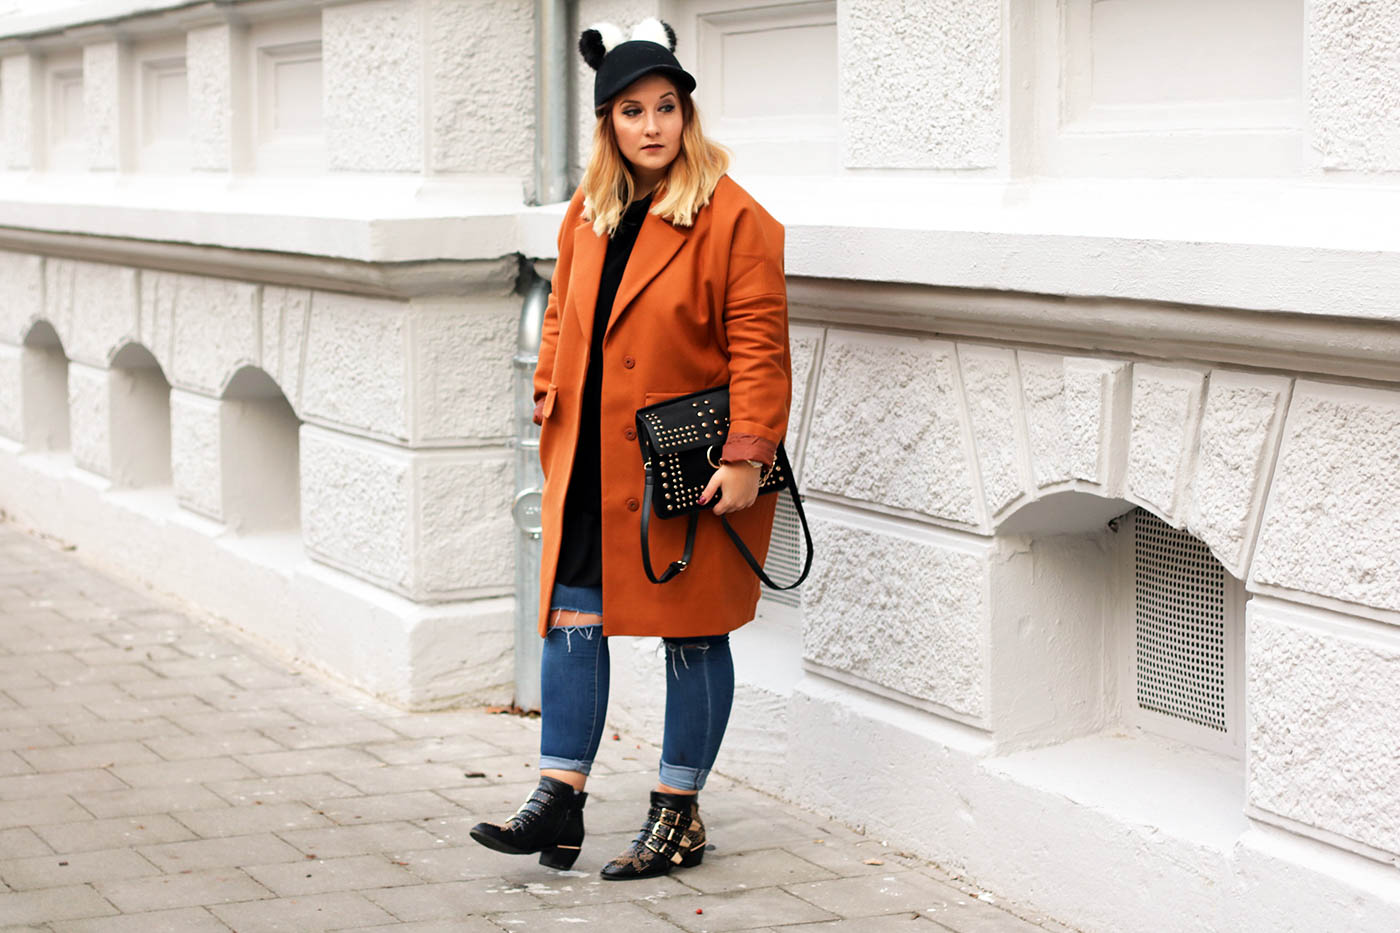 outfit-look-style-mantel-cappe-fashionblog-modeblog-gewinnspiel6